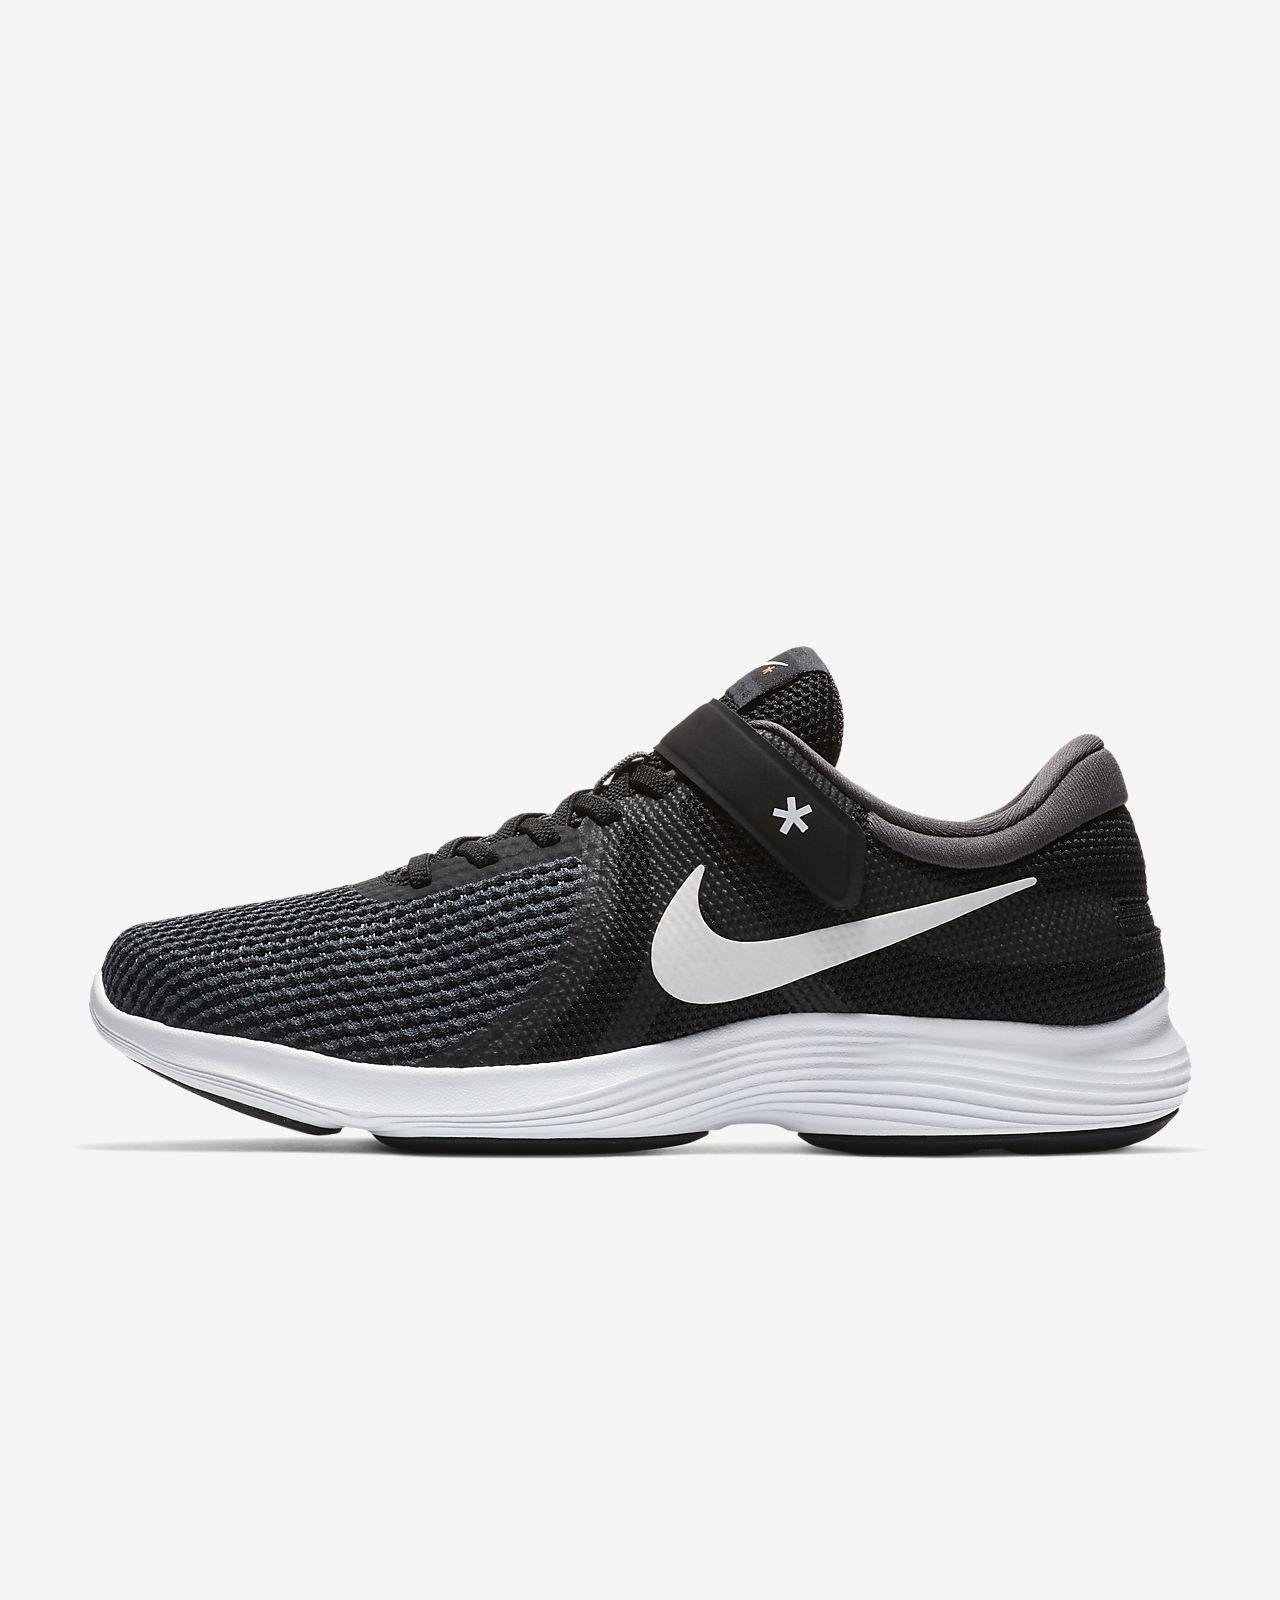 Scarpa da running Nike Revolution 4 FlyEase - Uomo